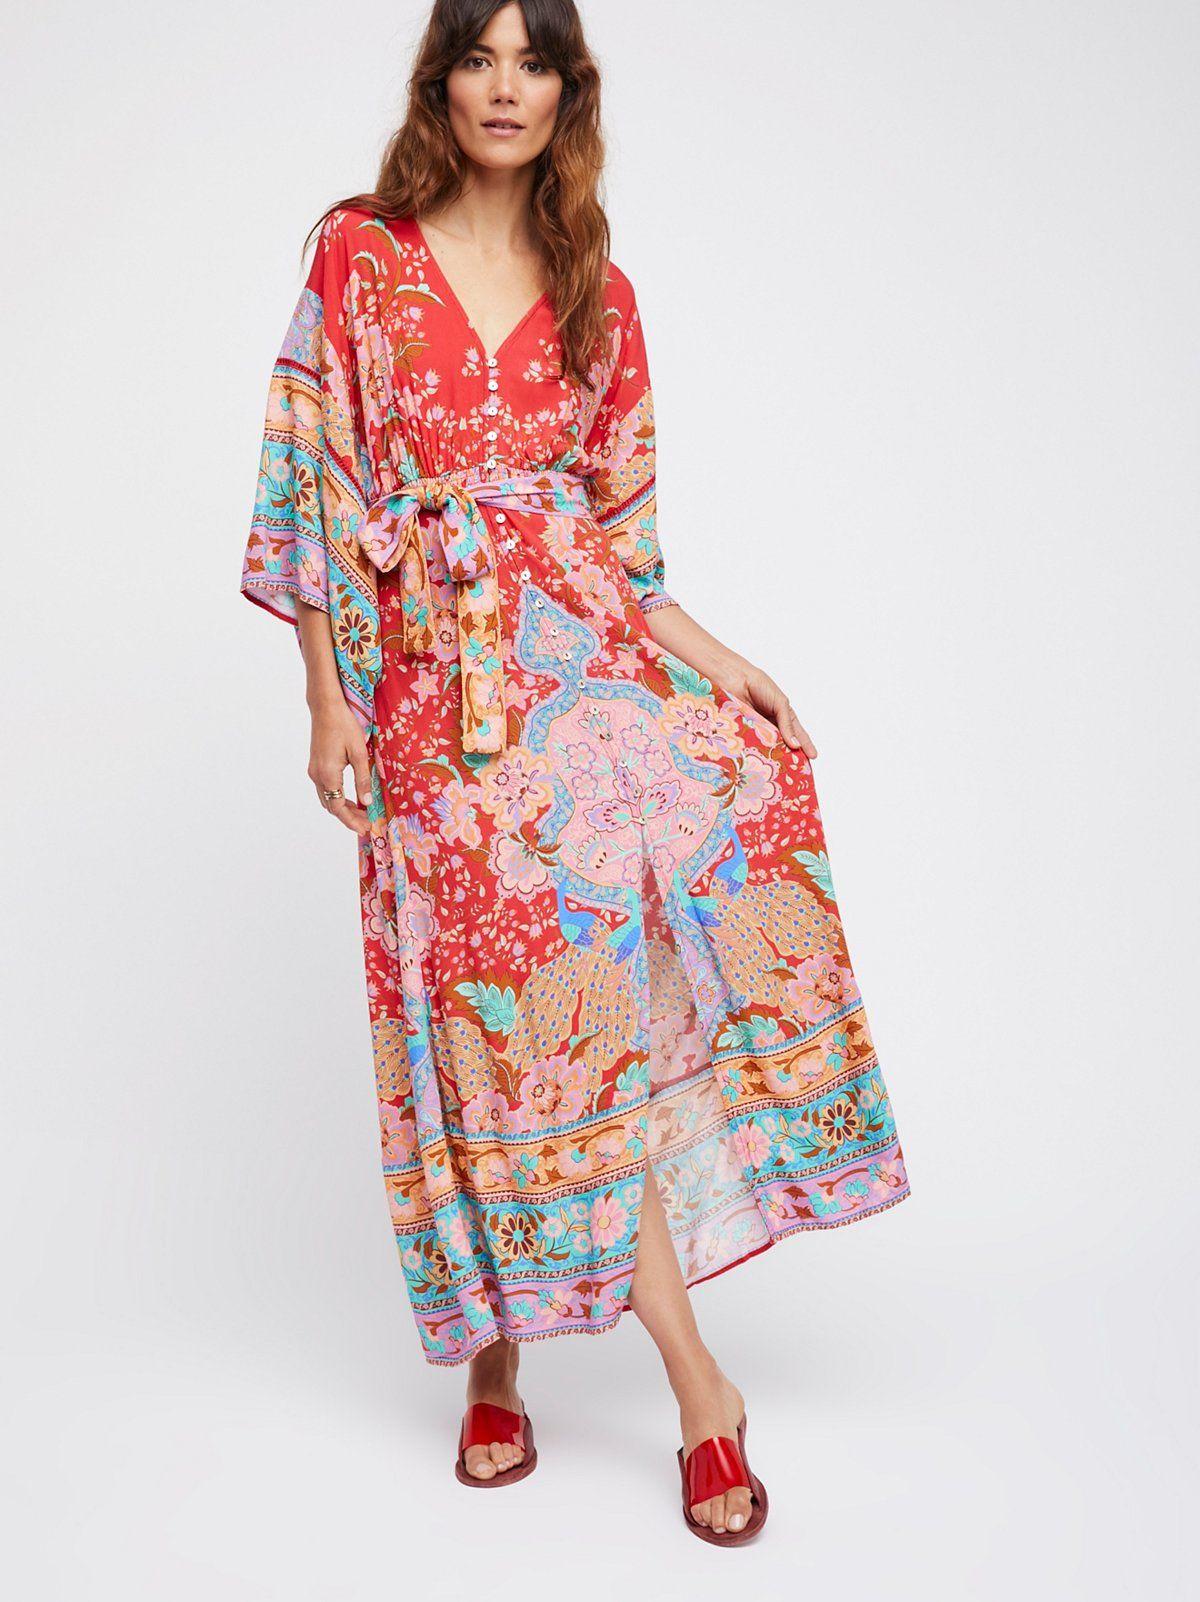 Lotus Gown | Jetsetting Bohemian Gypsy Hippie Warrior | Pinterest ...